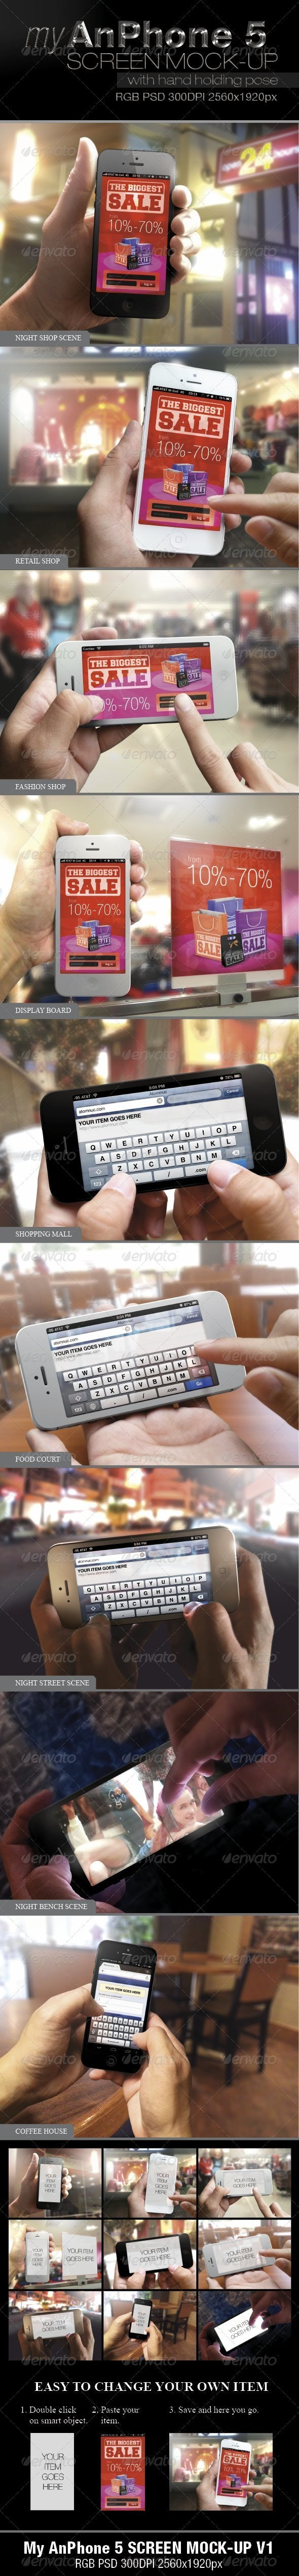 Iphone 5 Screen Mock-up V1 - Mobile Displays